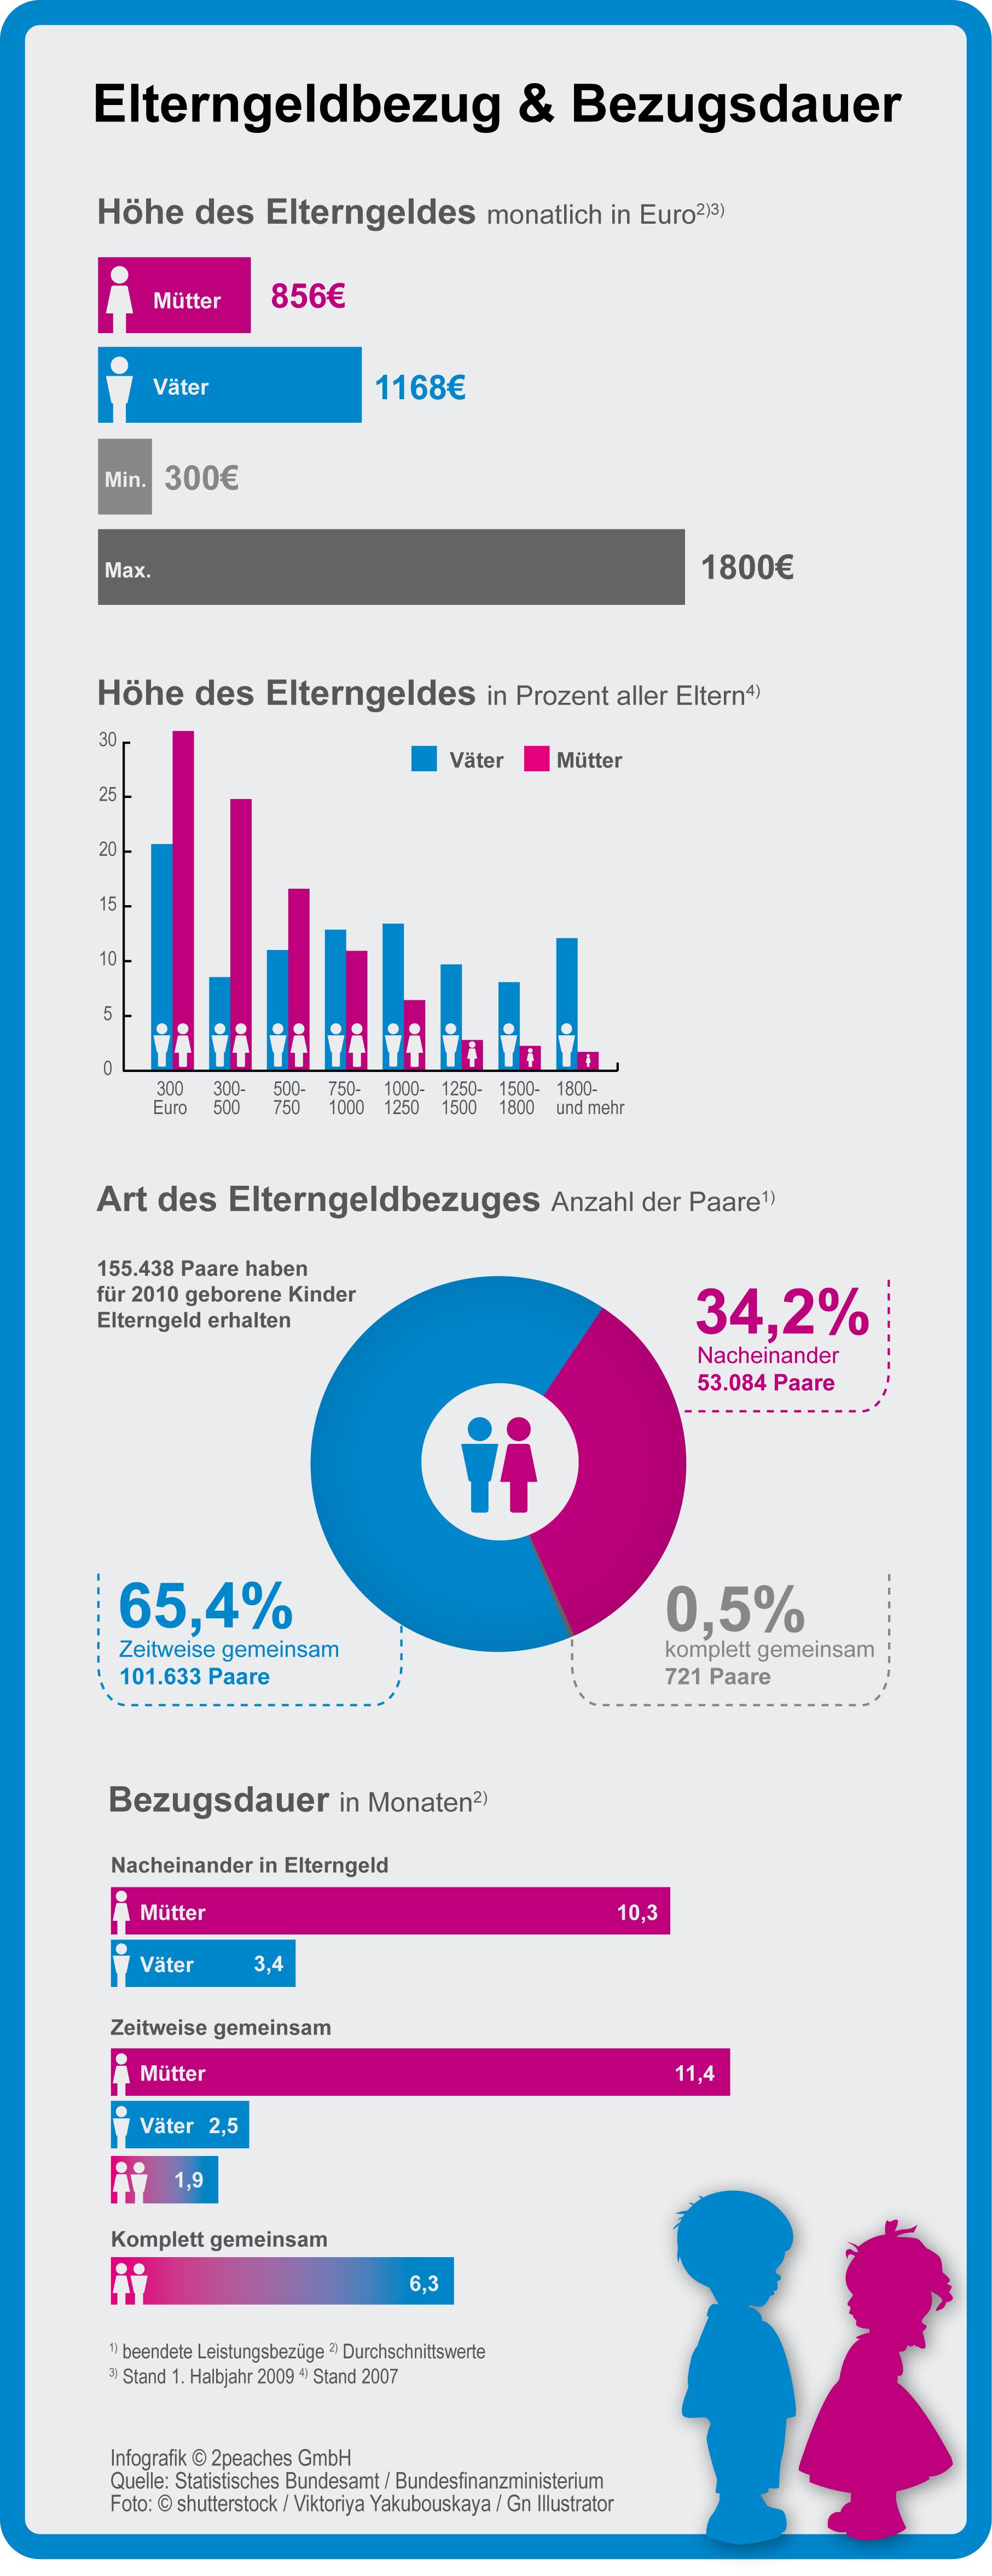 Infografik: Alle Fakten zum Elterngeld